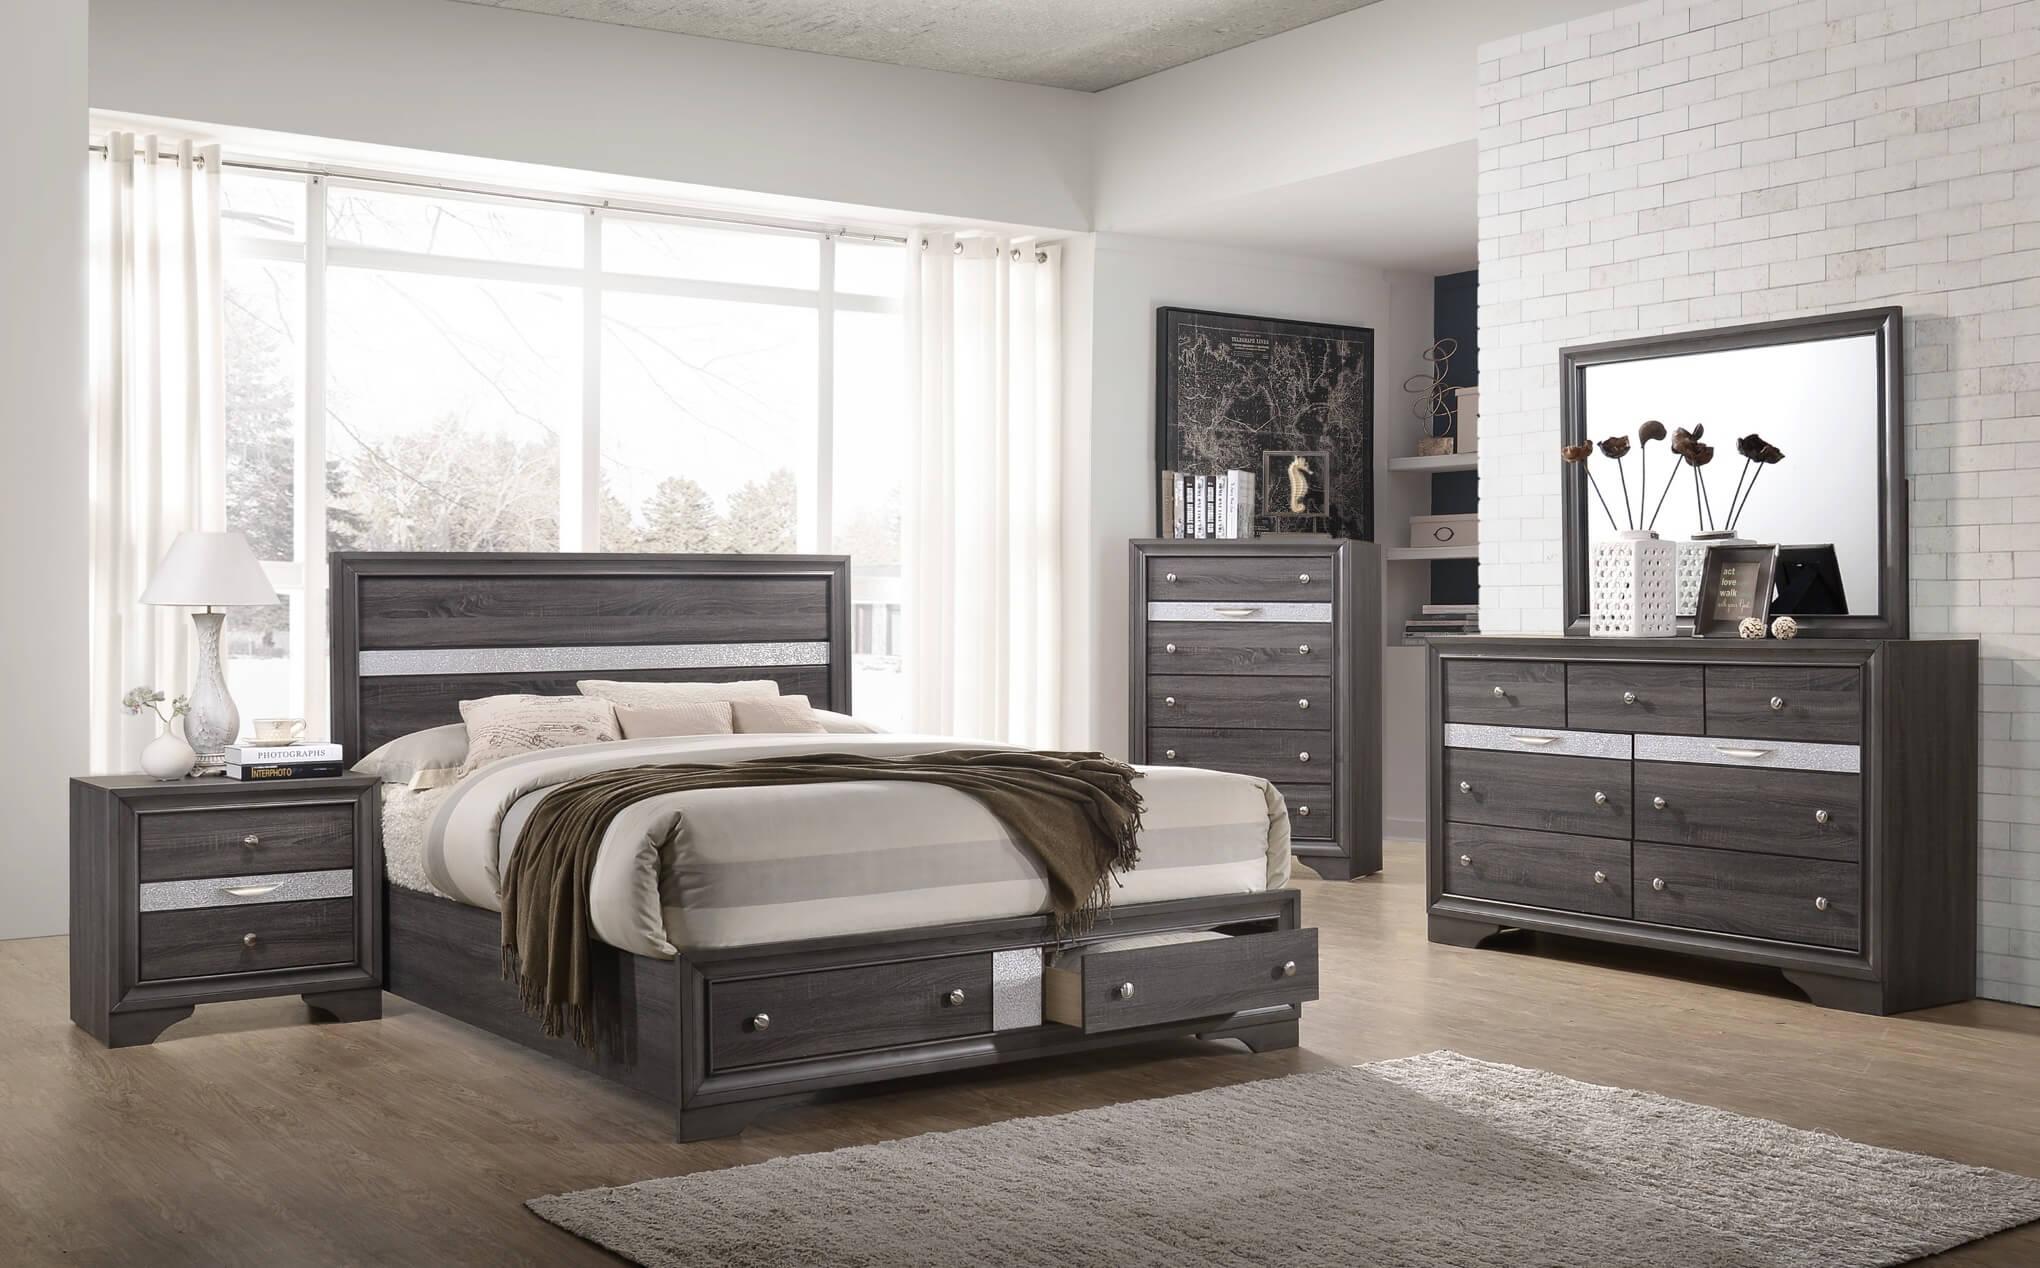 B6 Regata Grey Storage Bedroom Set